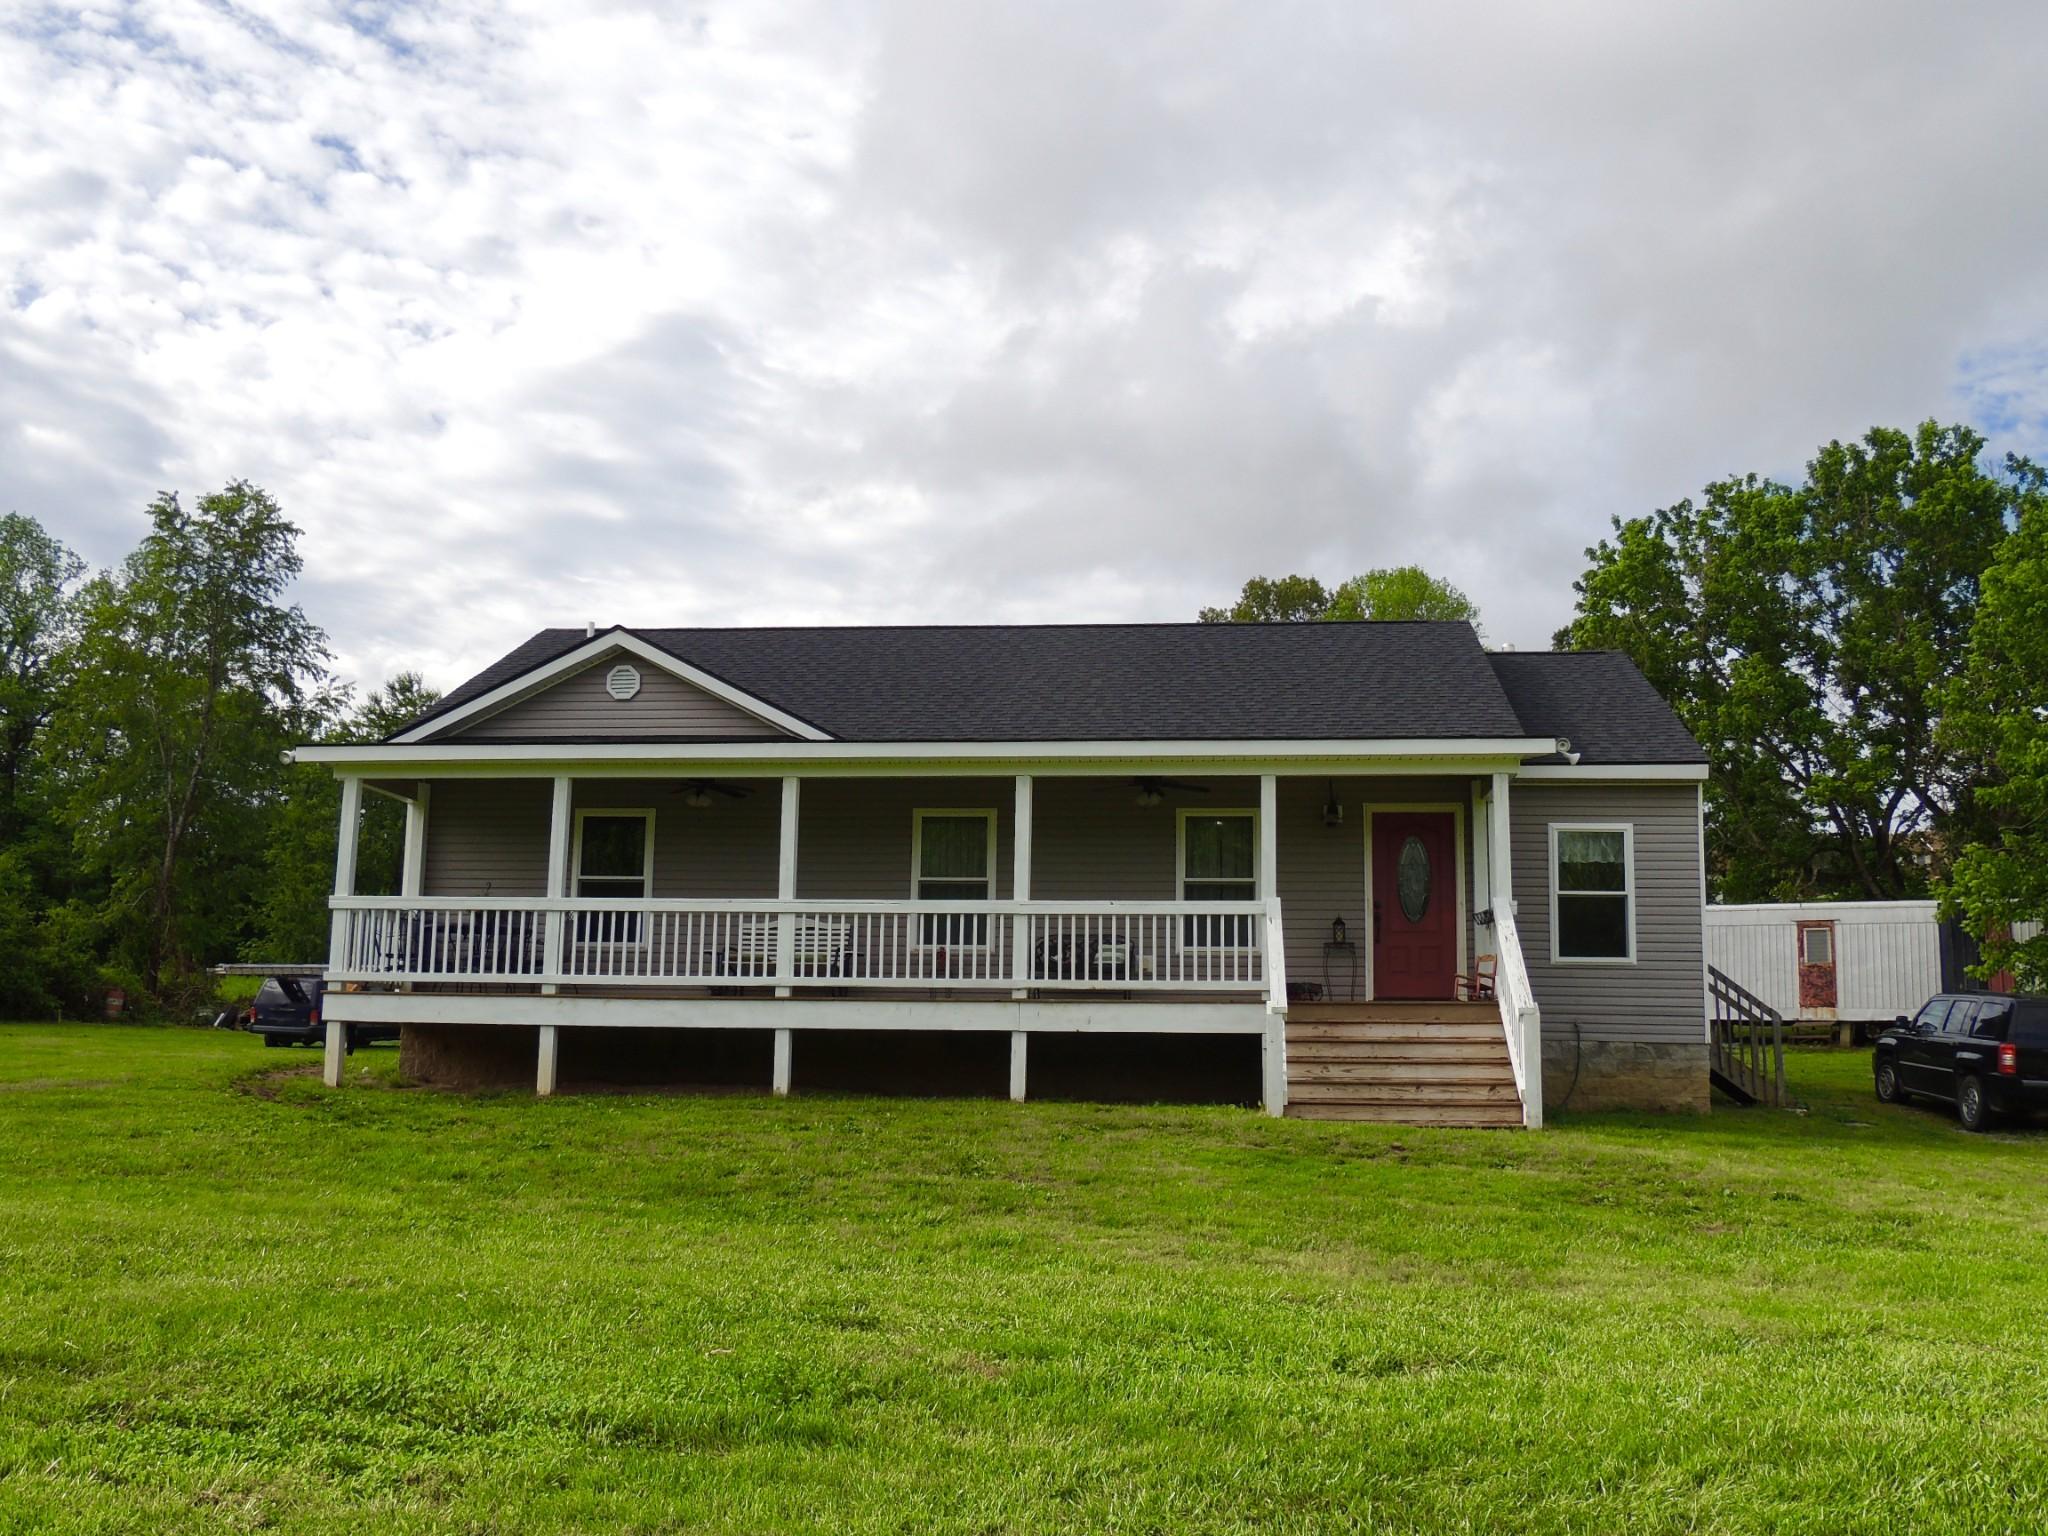 6023 Buckner Rd, Cumberland Furnace, TN 37051 - Cumberland Furnace, TN real estate listing